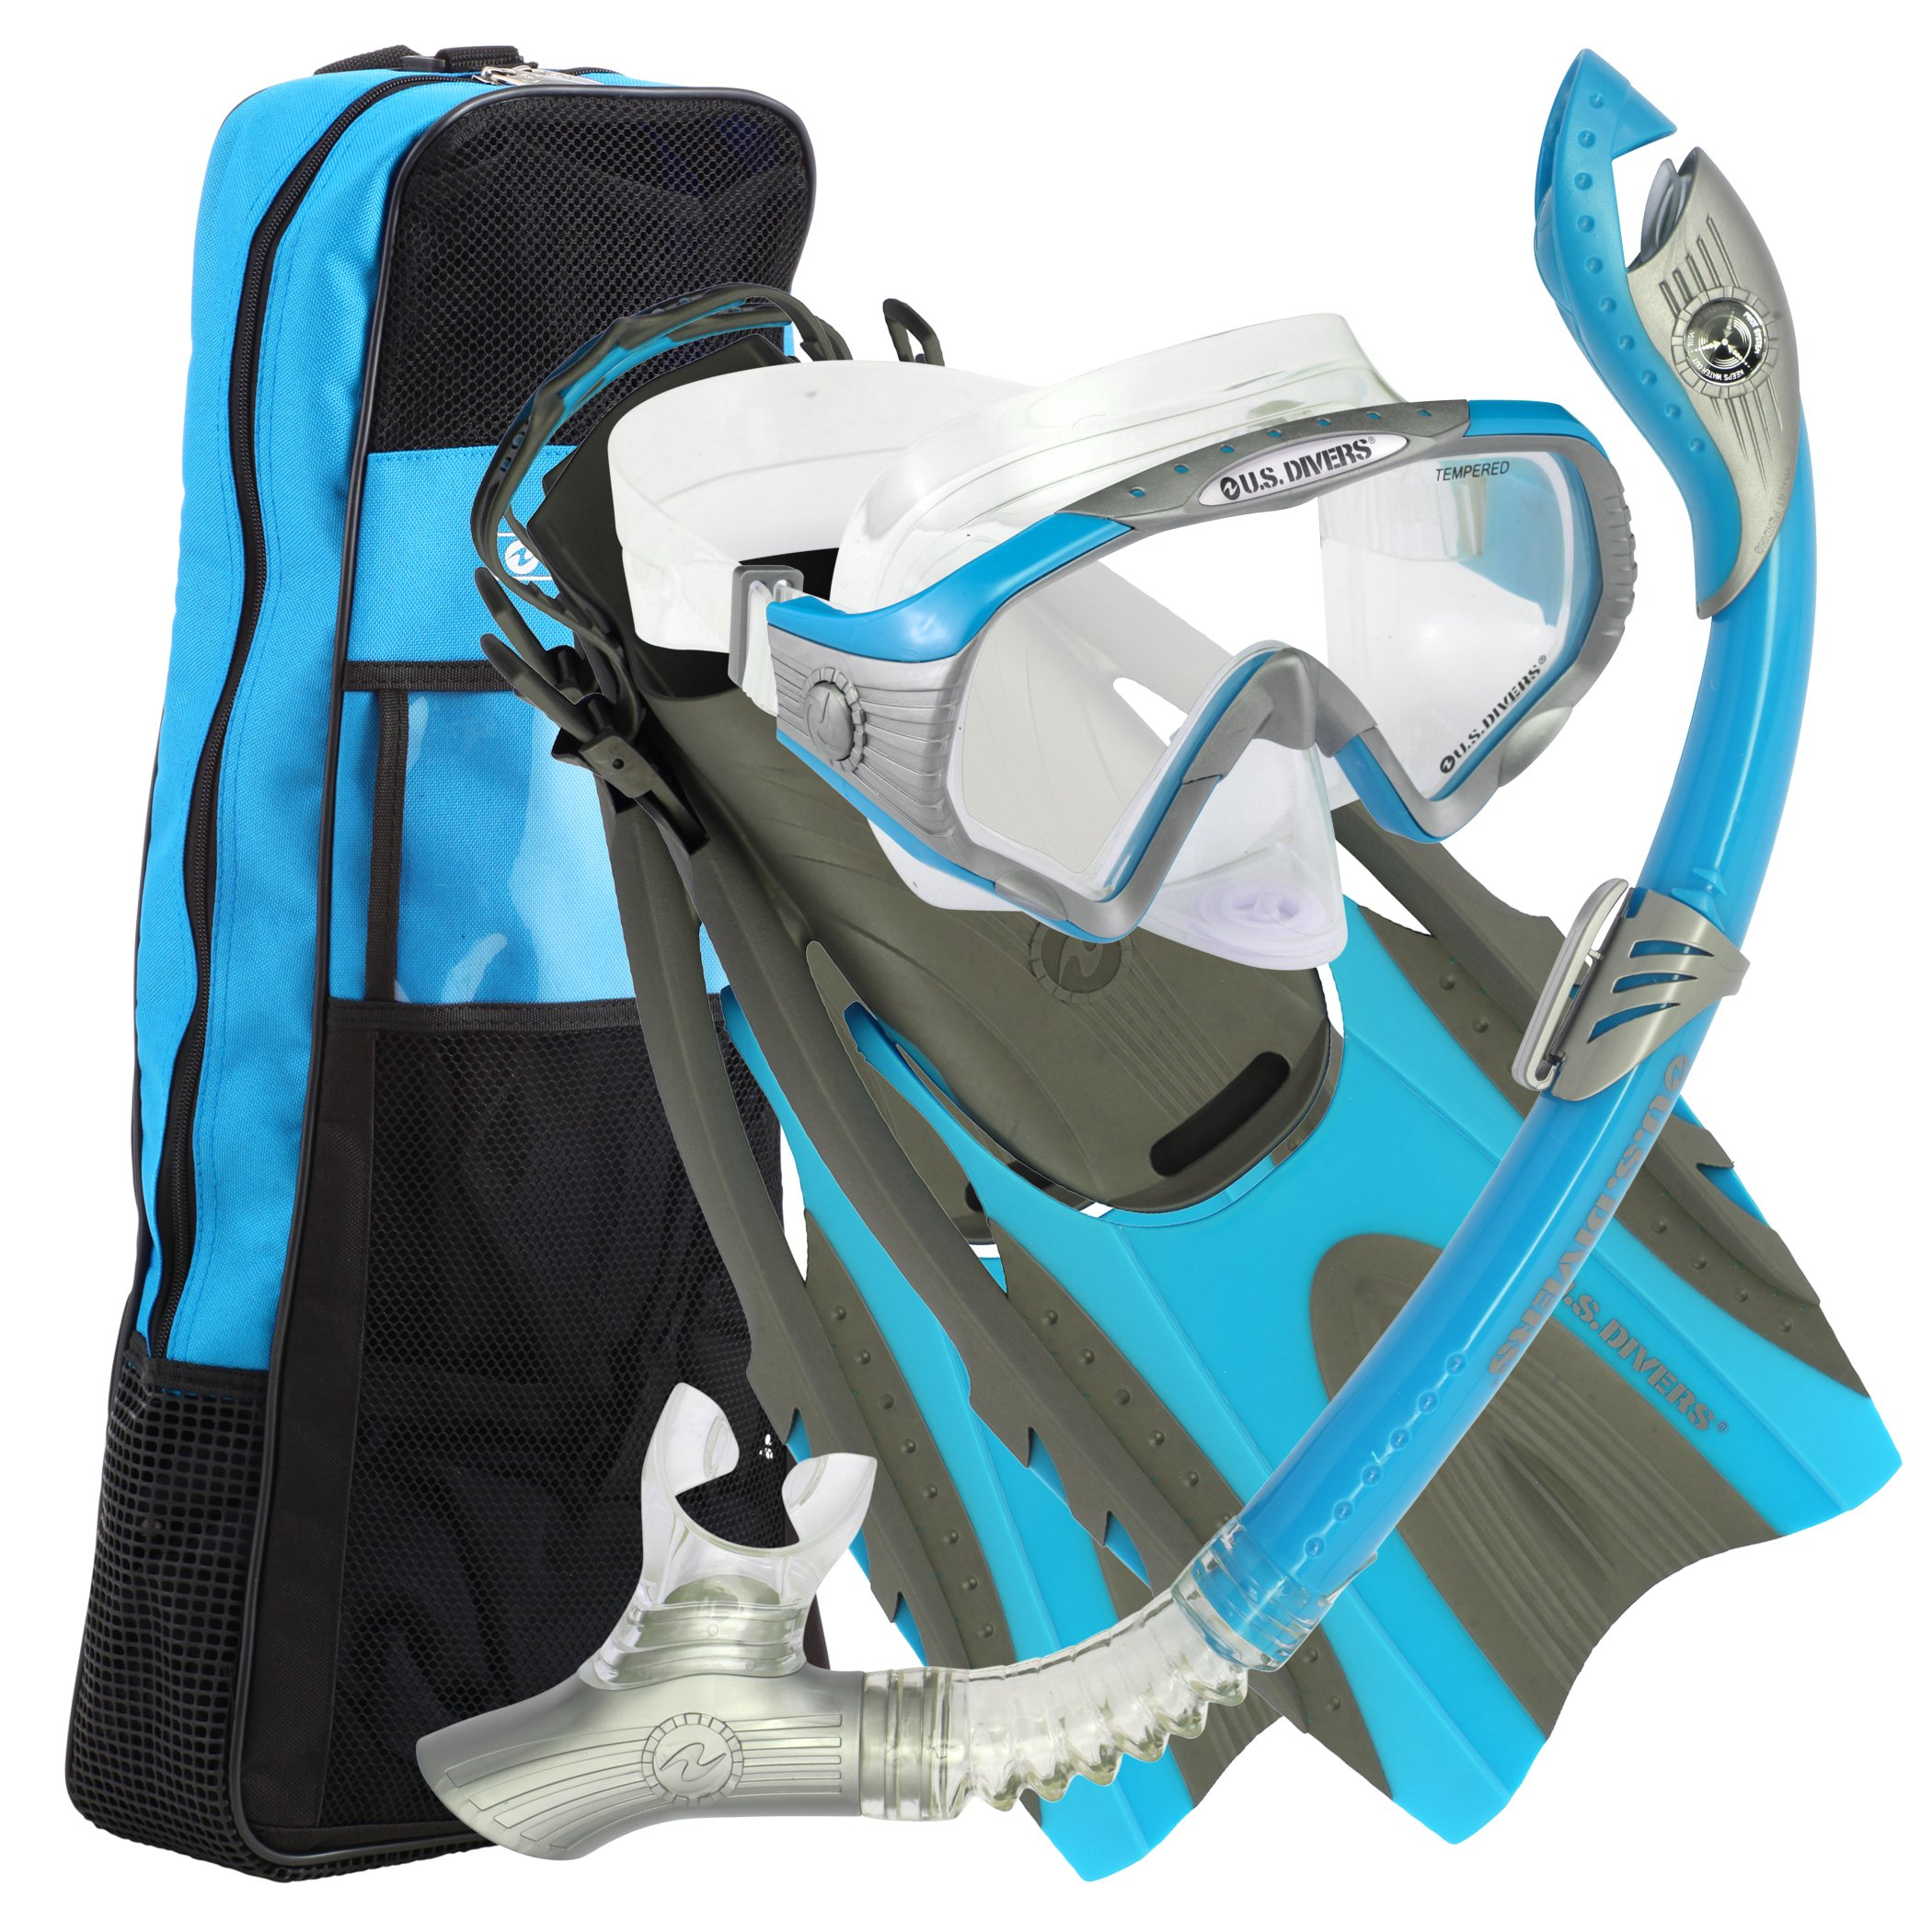 U.S. Divers Purge Mask, Hingeflex Fins, Dry Snorkel Set, with Snorkeling Gear Bag, PBL-SM by U.S. Divers